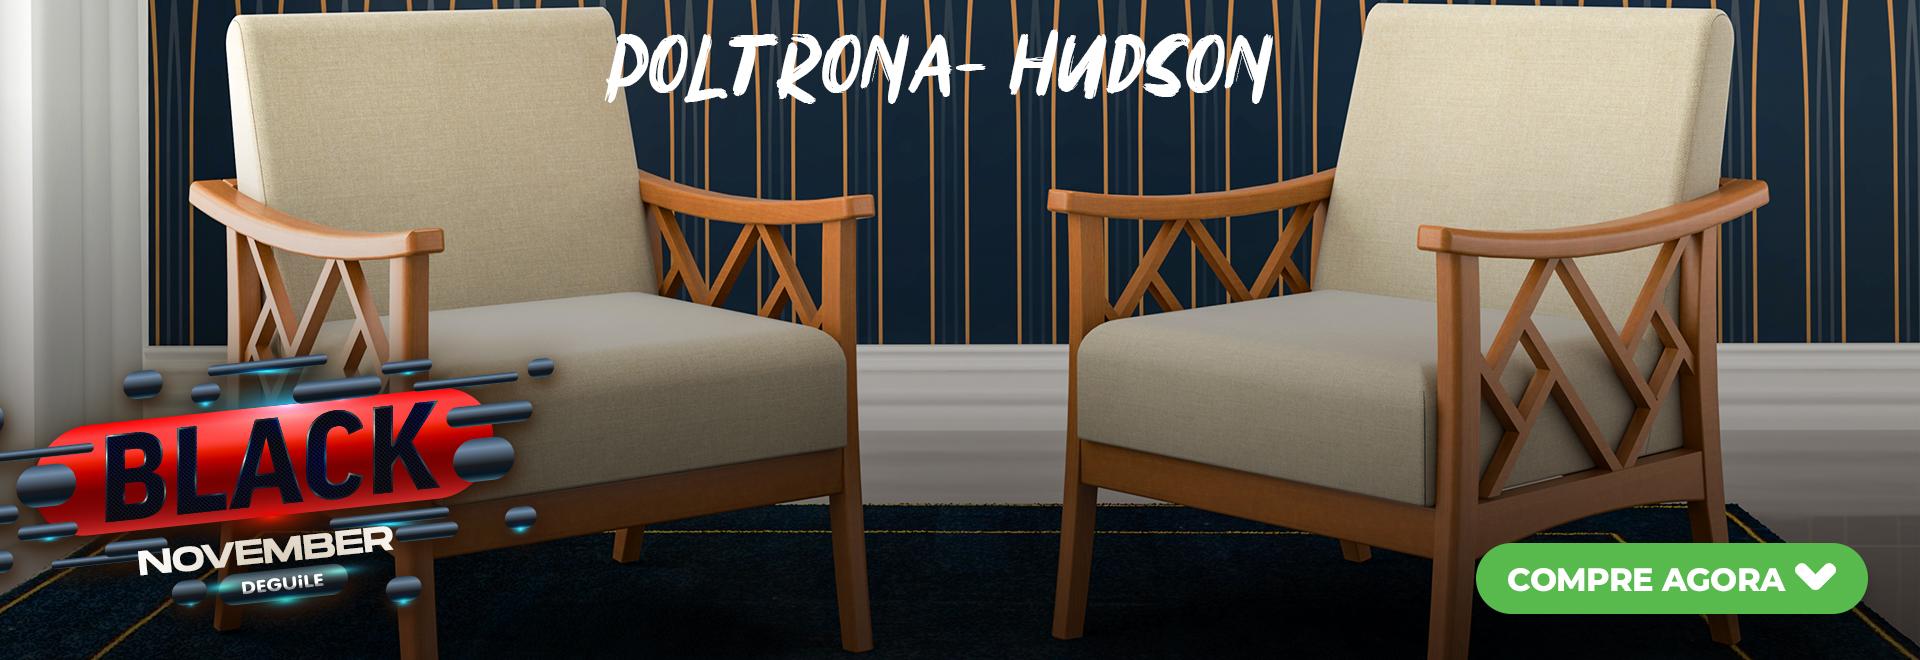 Poltrona - HUDSON